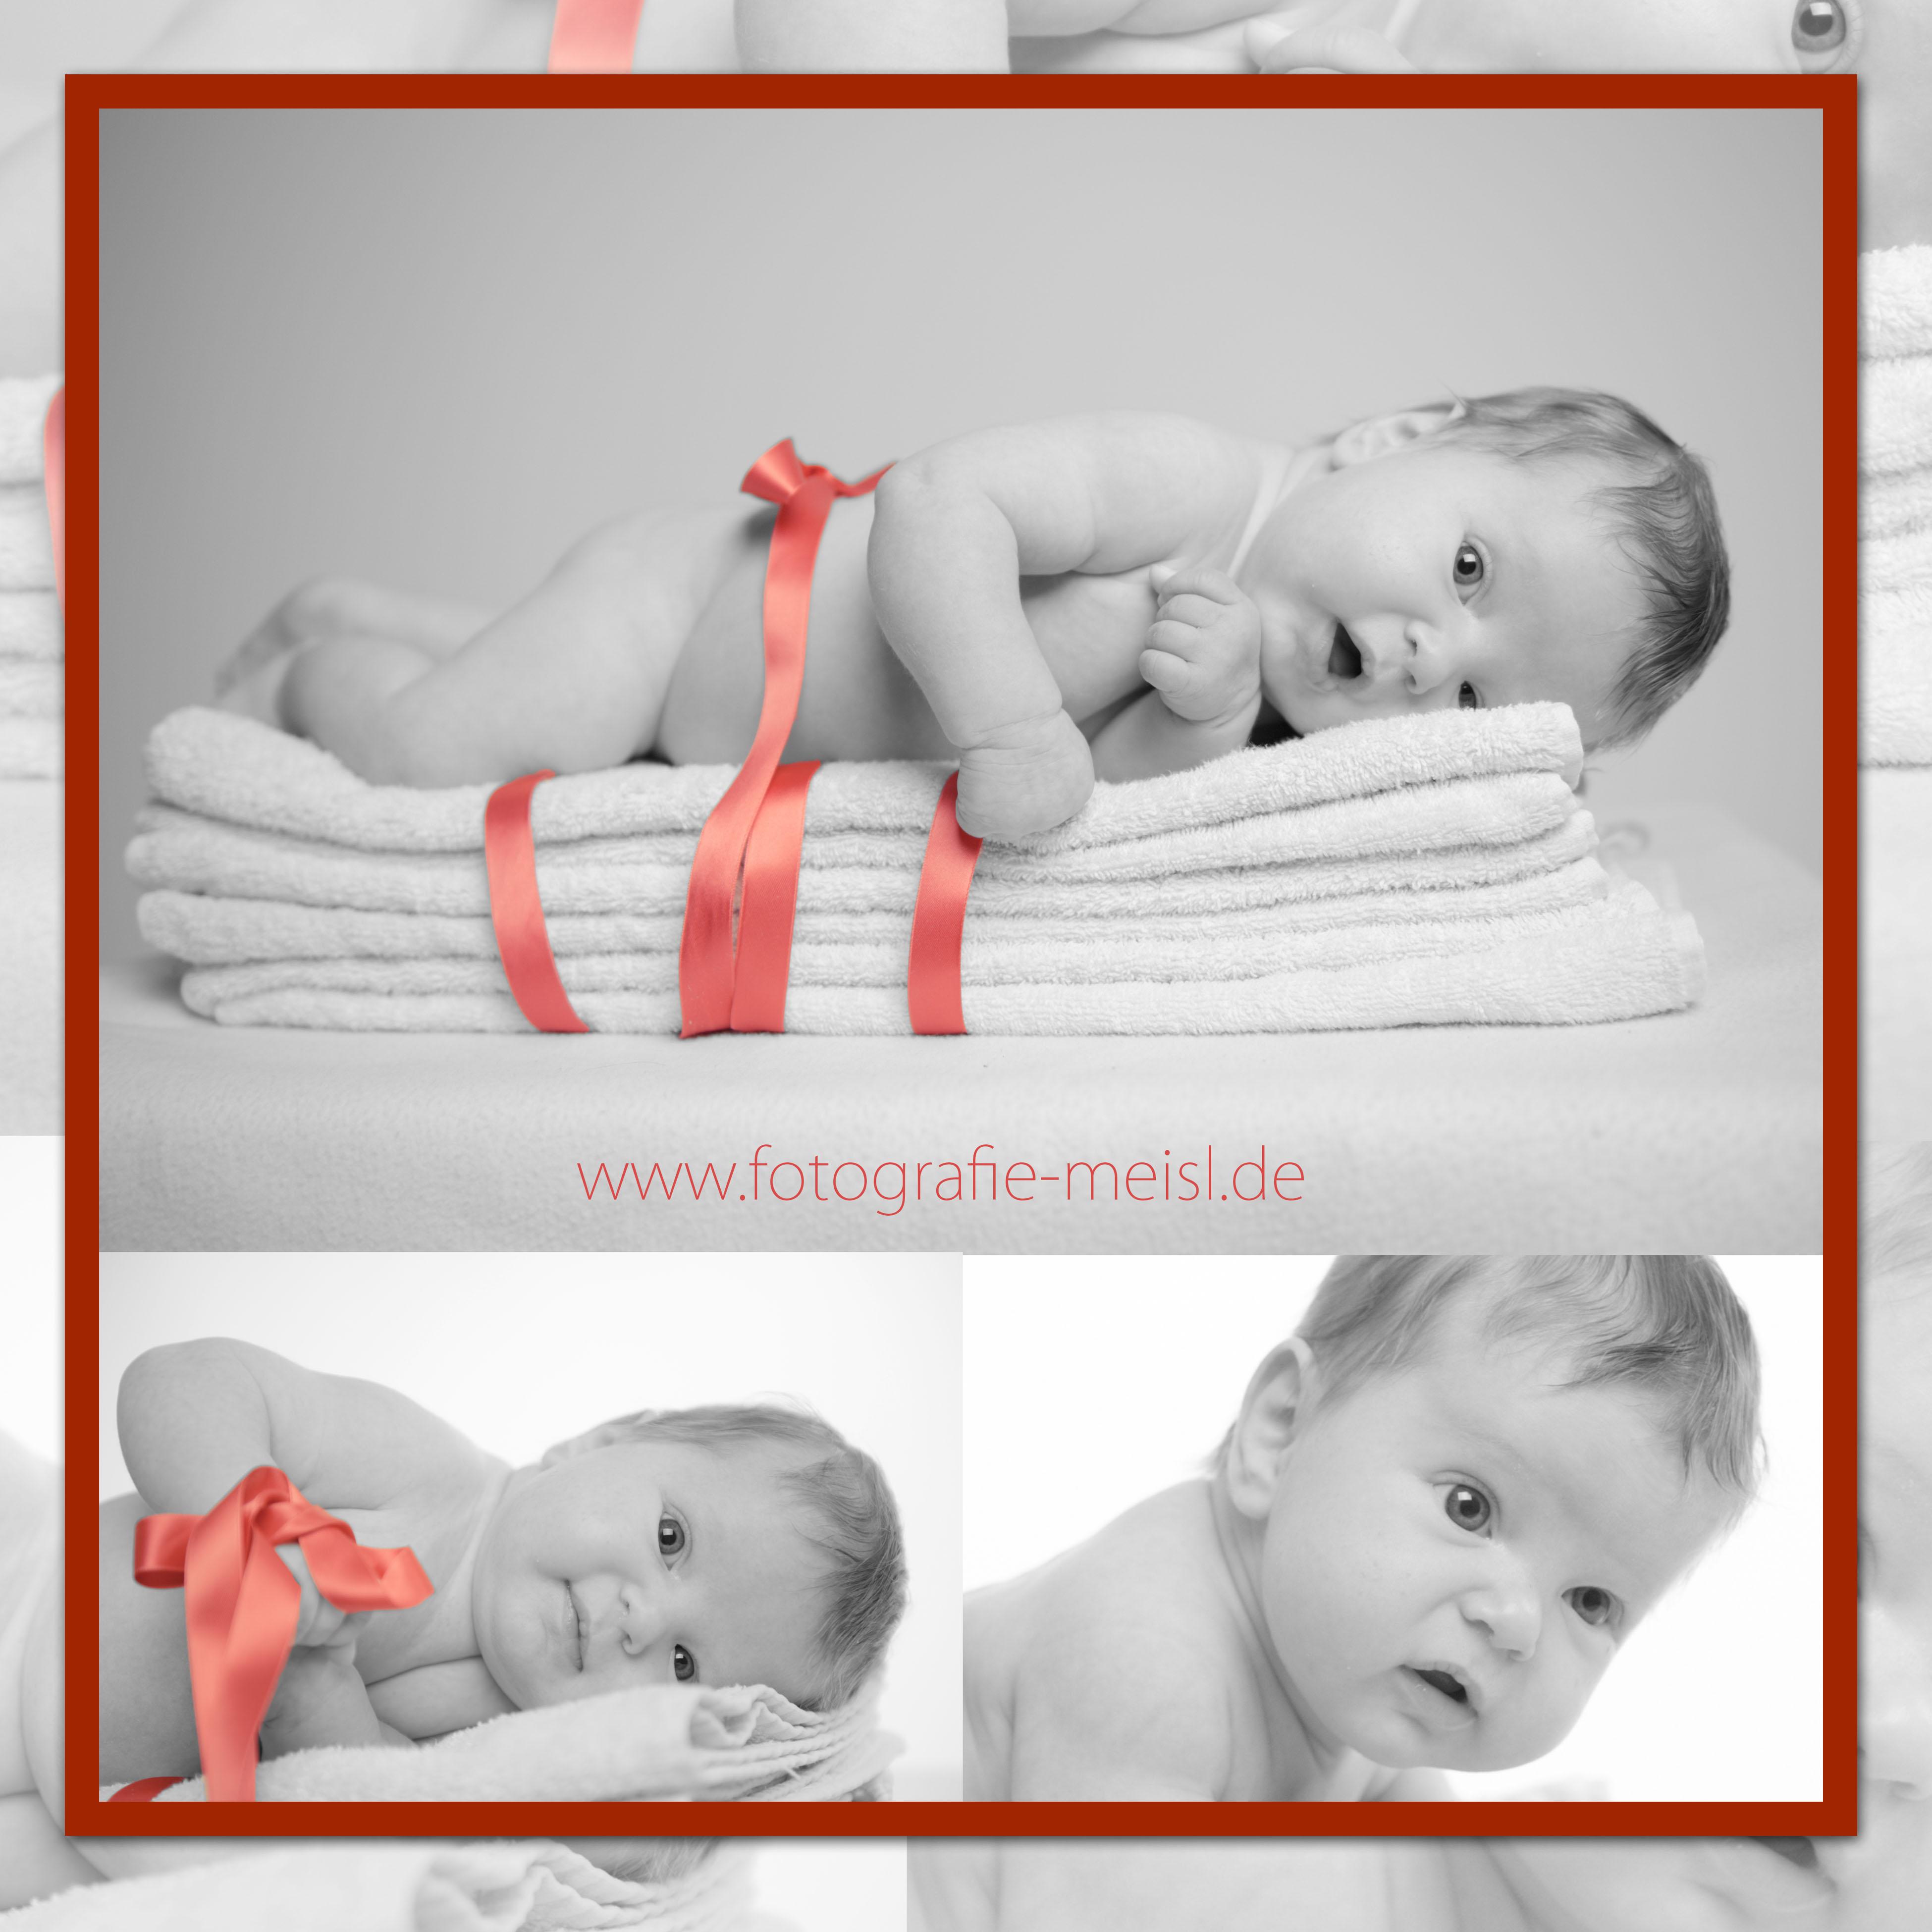 Babyfotos, Fotos Baby, Neugeborenen